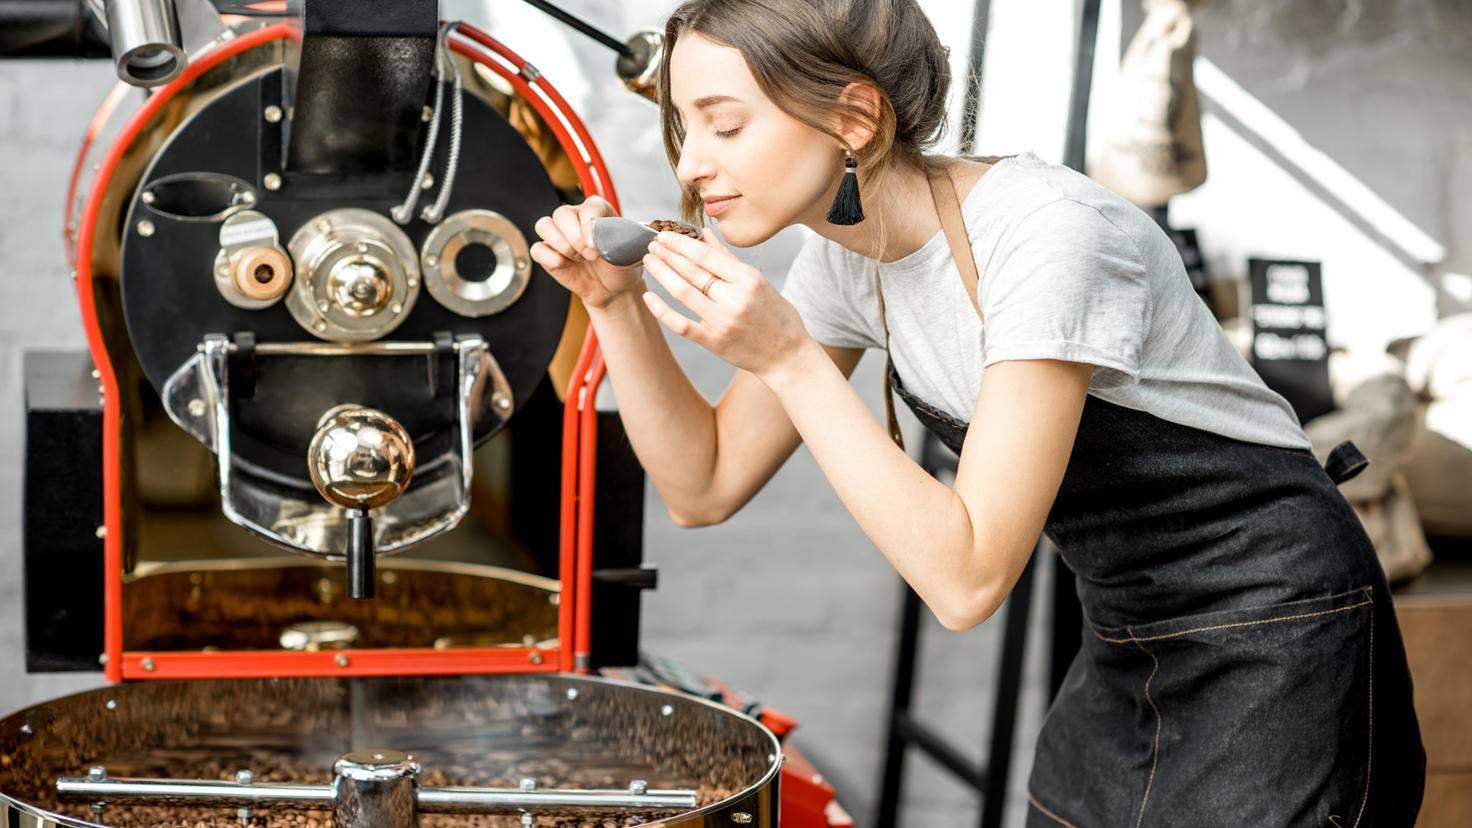 Kaffee-Bohnen-Rösterei-rh2010-AdobeStock_198707593